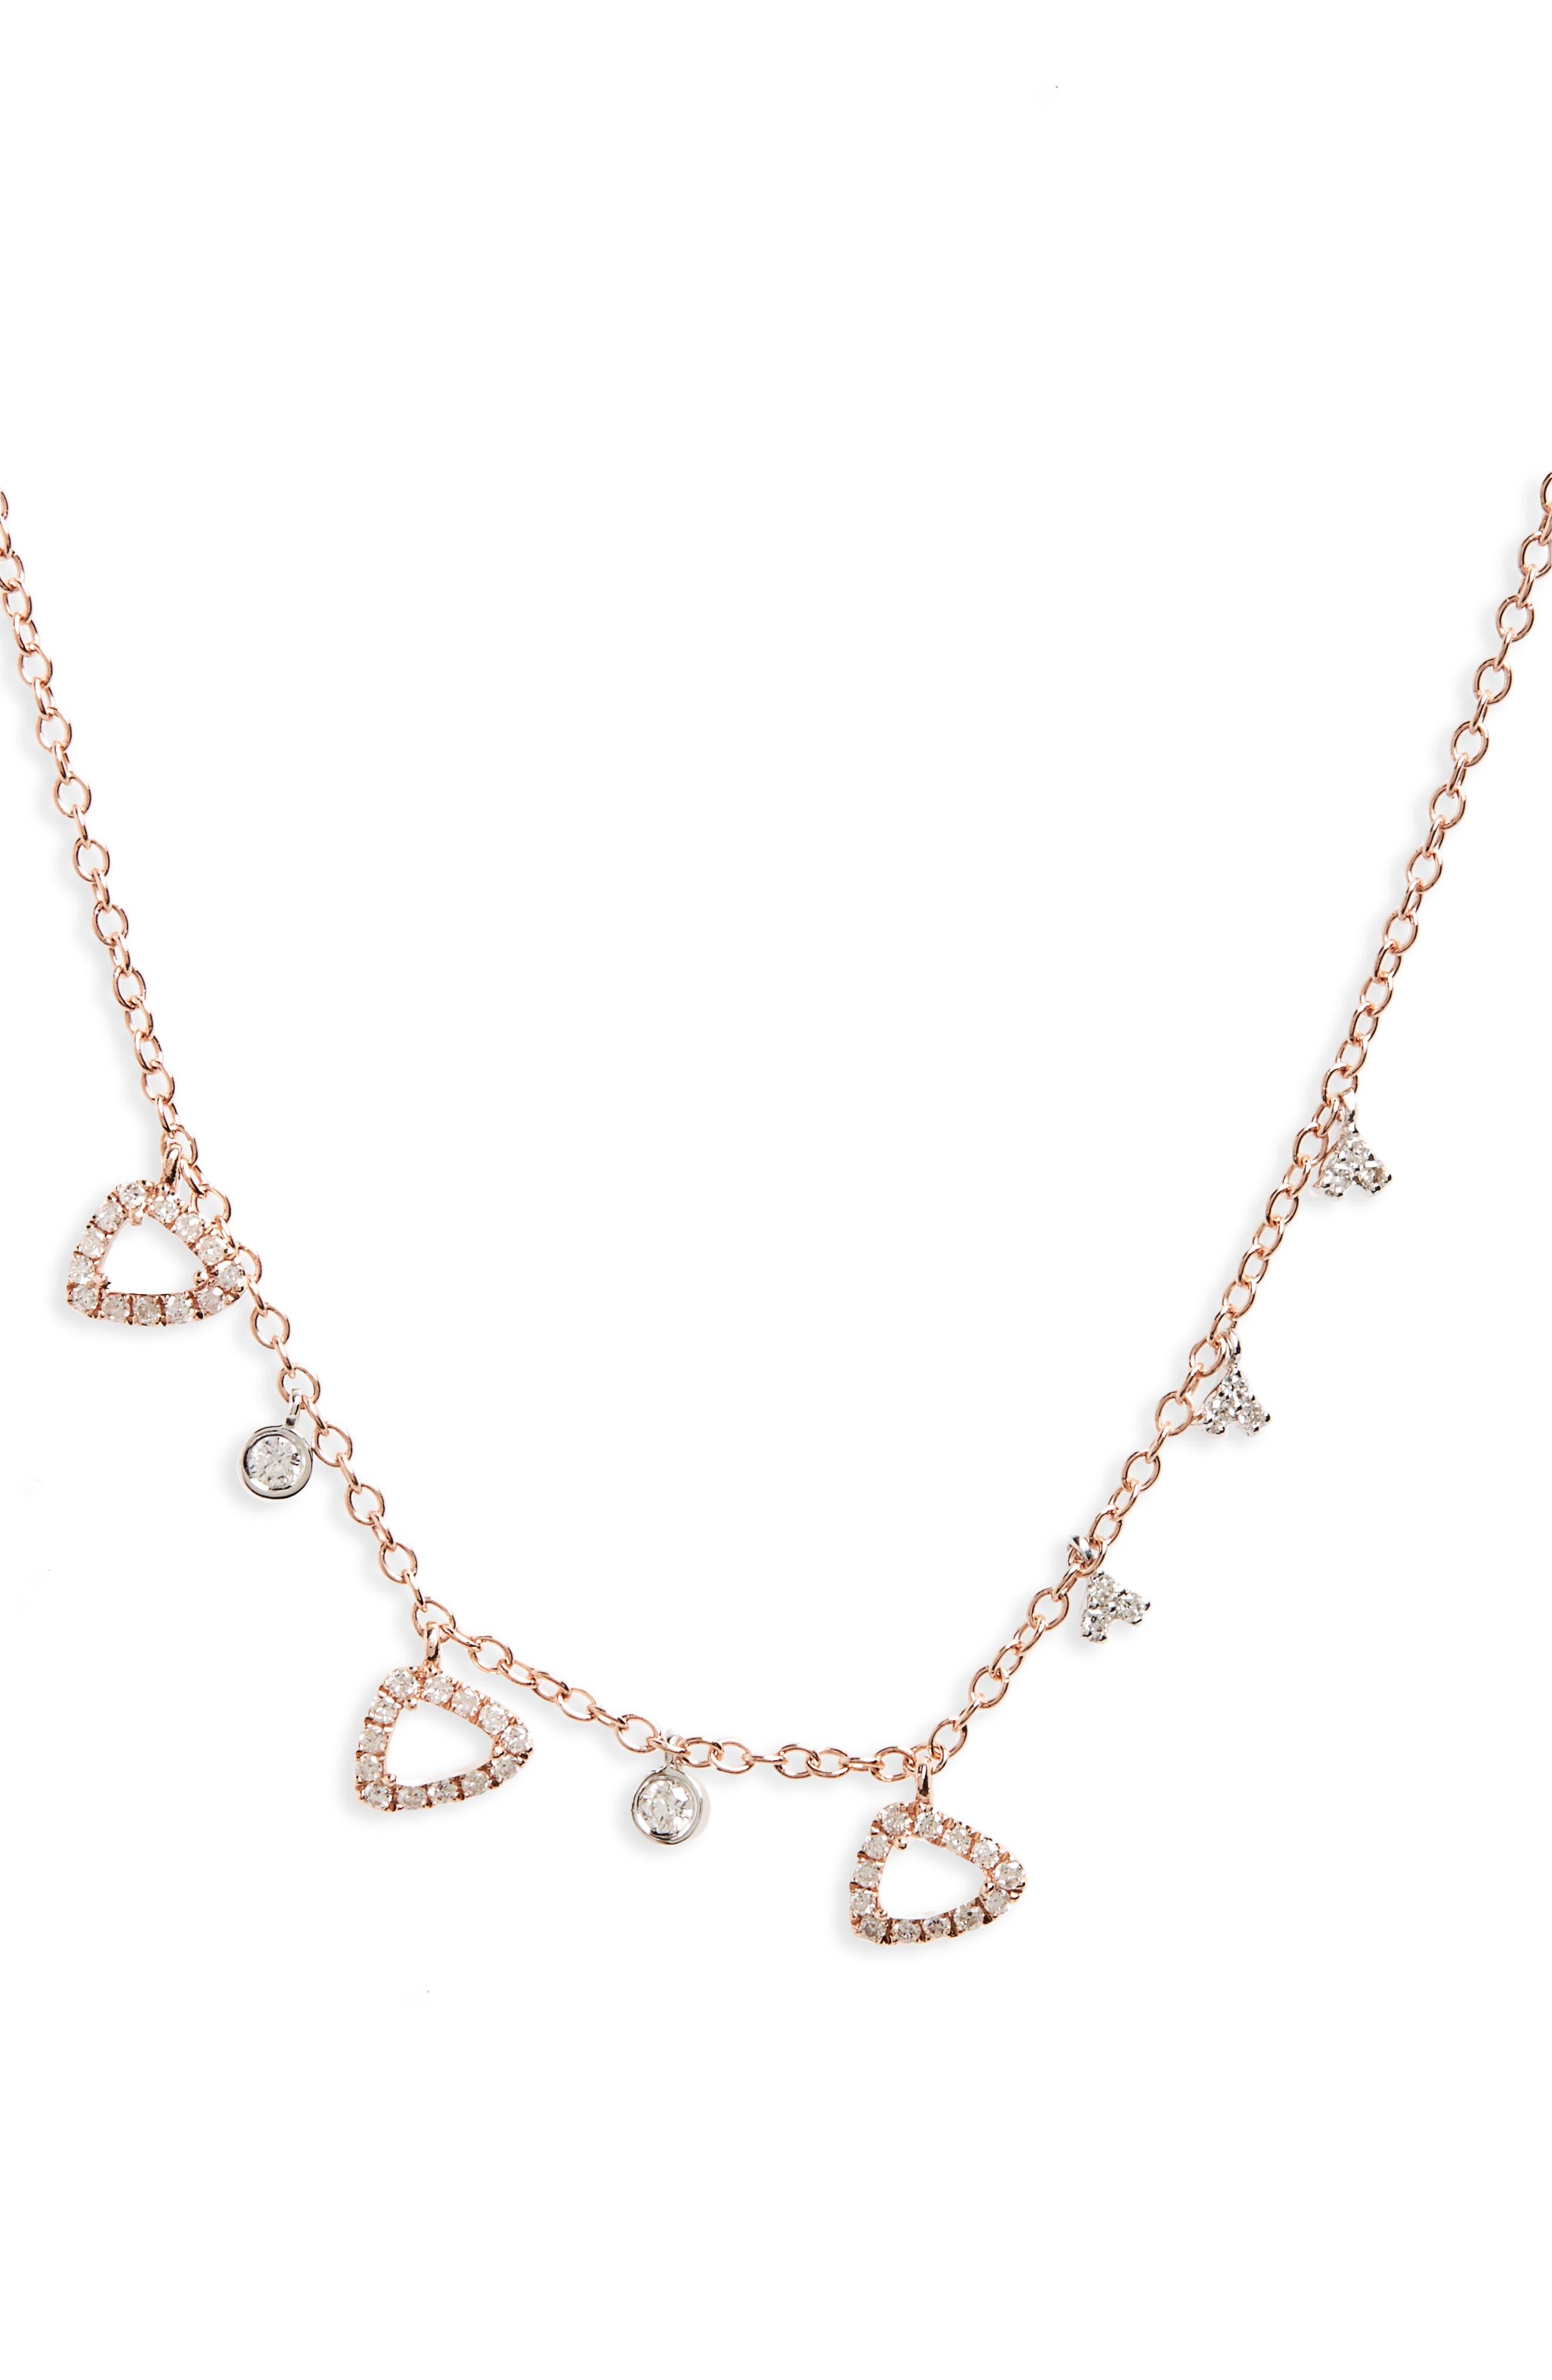 Semiprecious Stone Frontal Necklace,                             Main thumbnail 1, color,                             Rose Gold